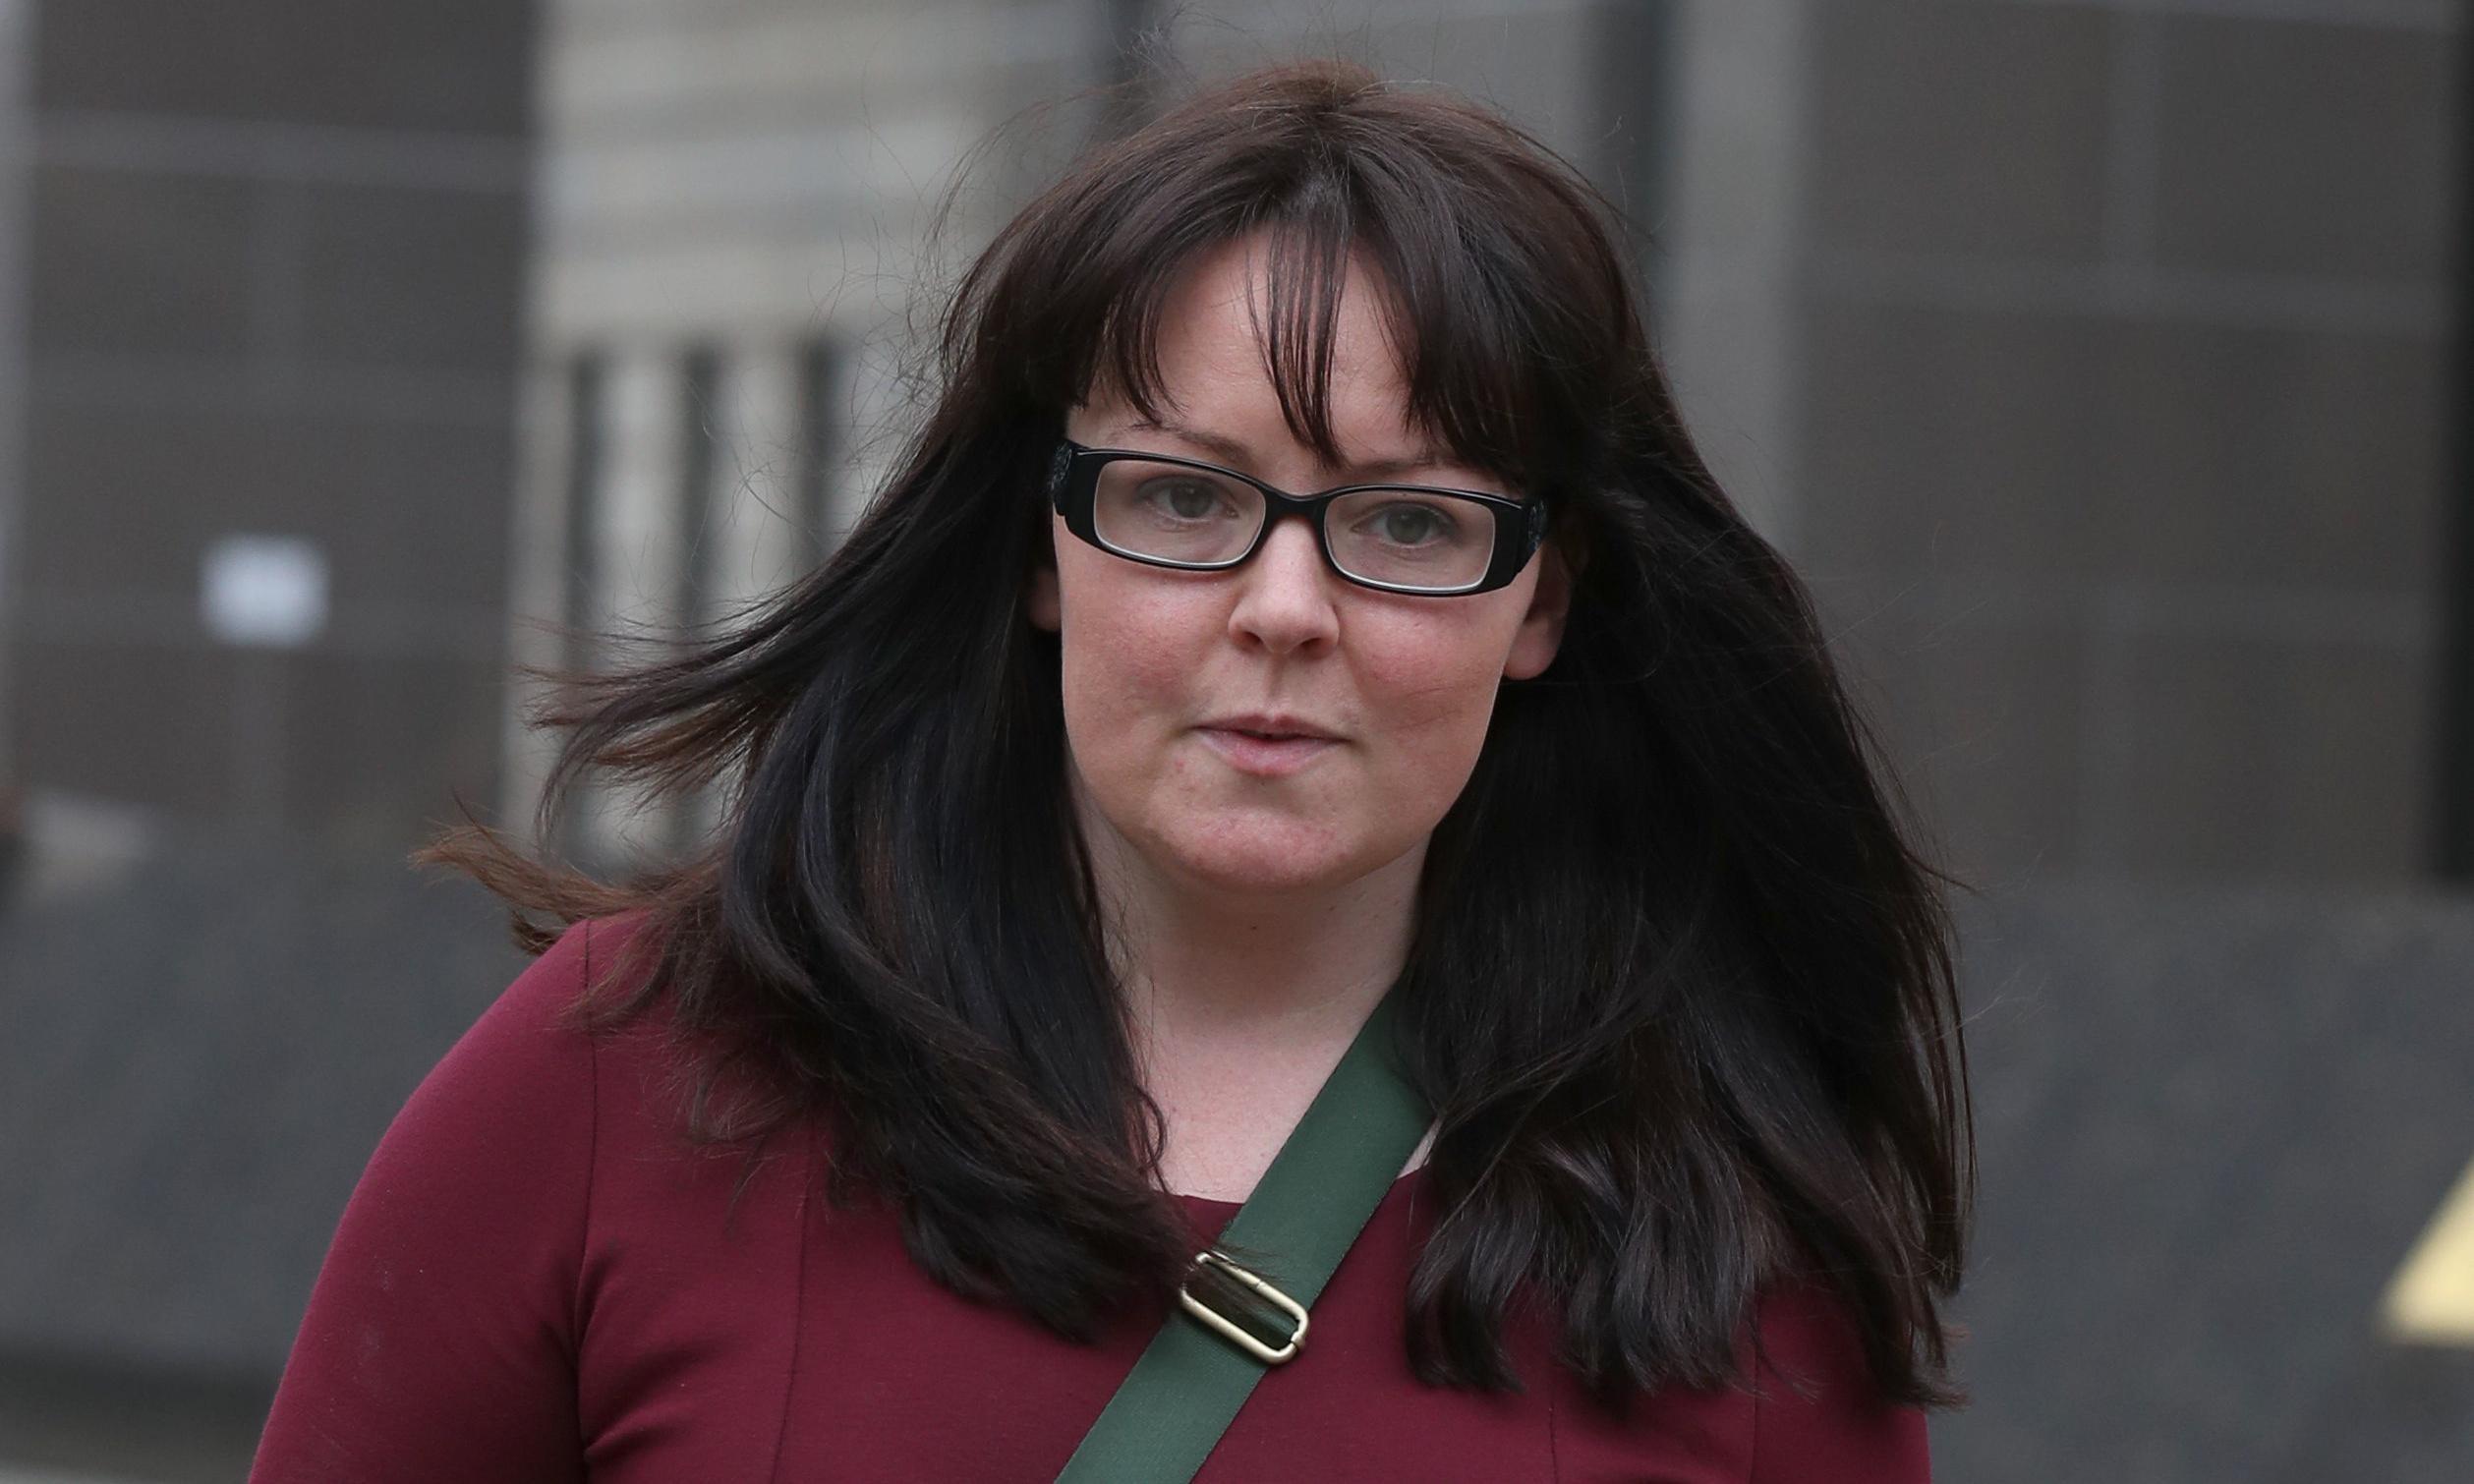 Ex-SNP MP Natalie McGarry admits embezzling £25,000